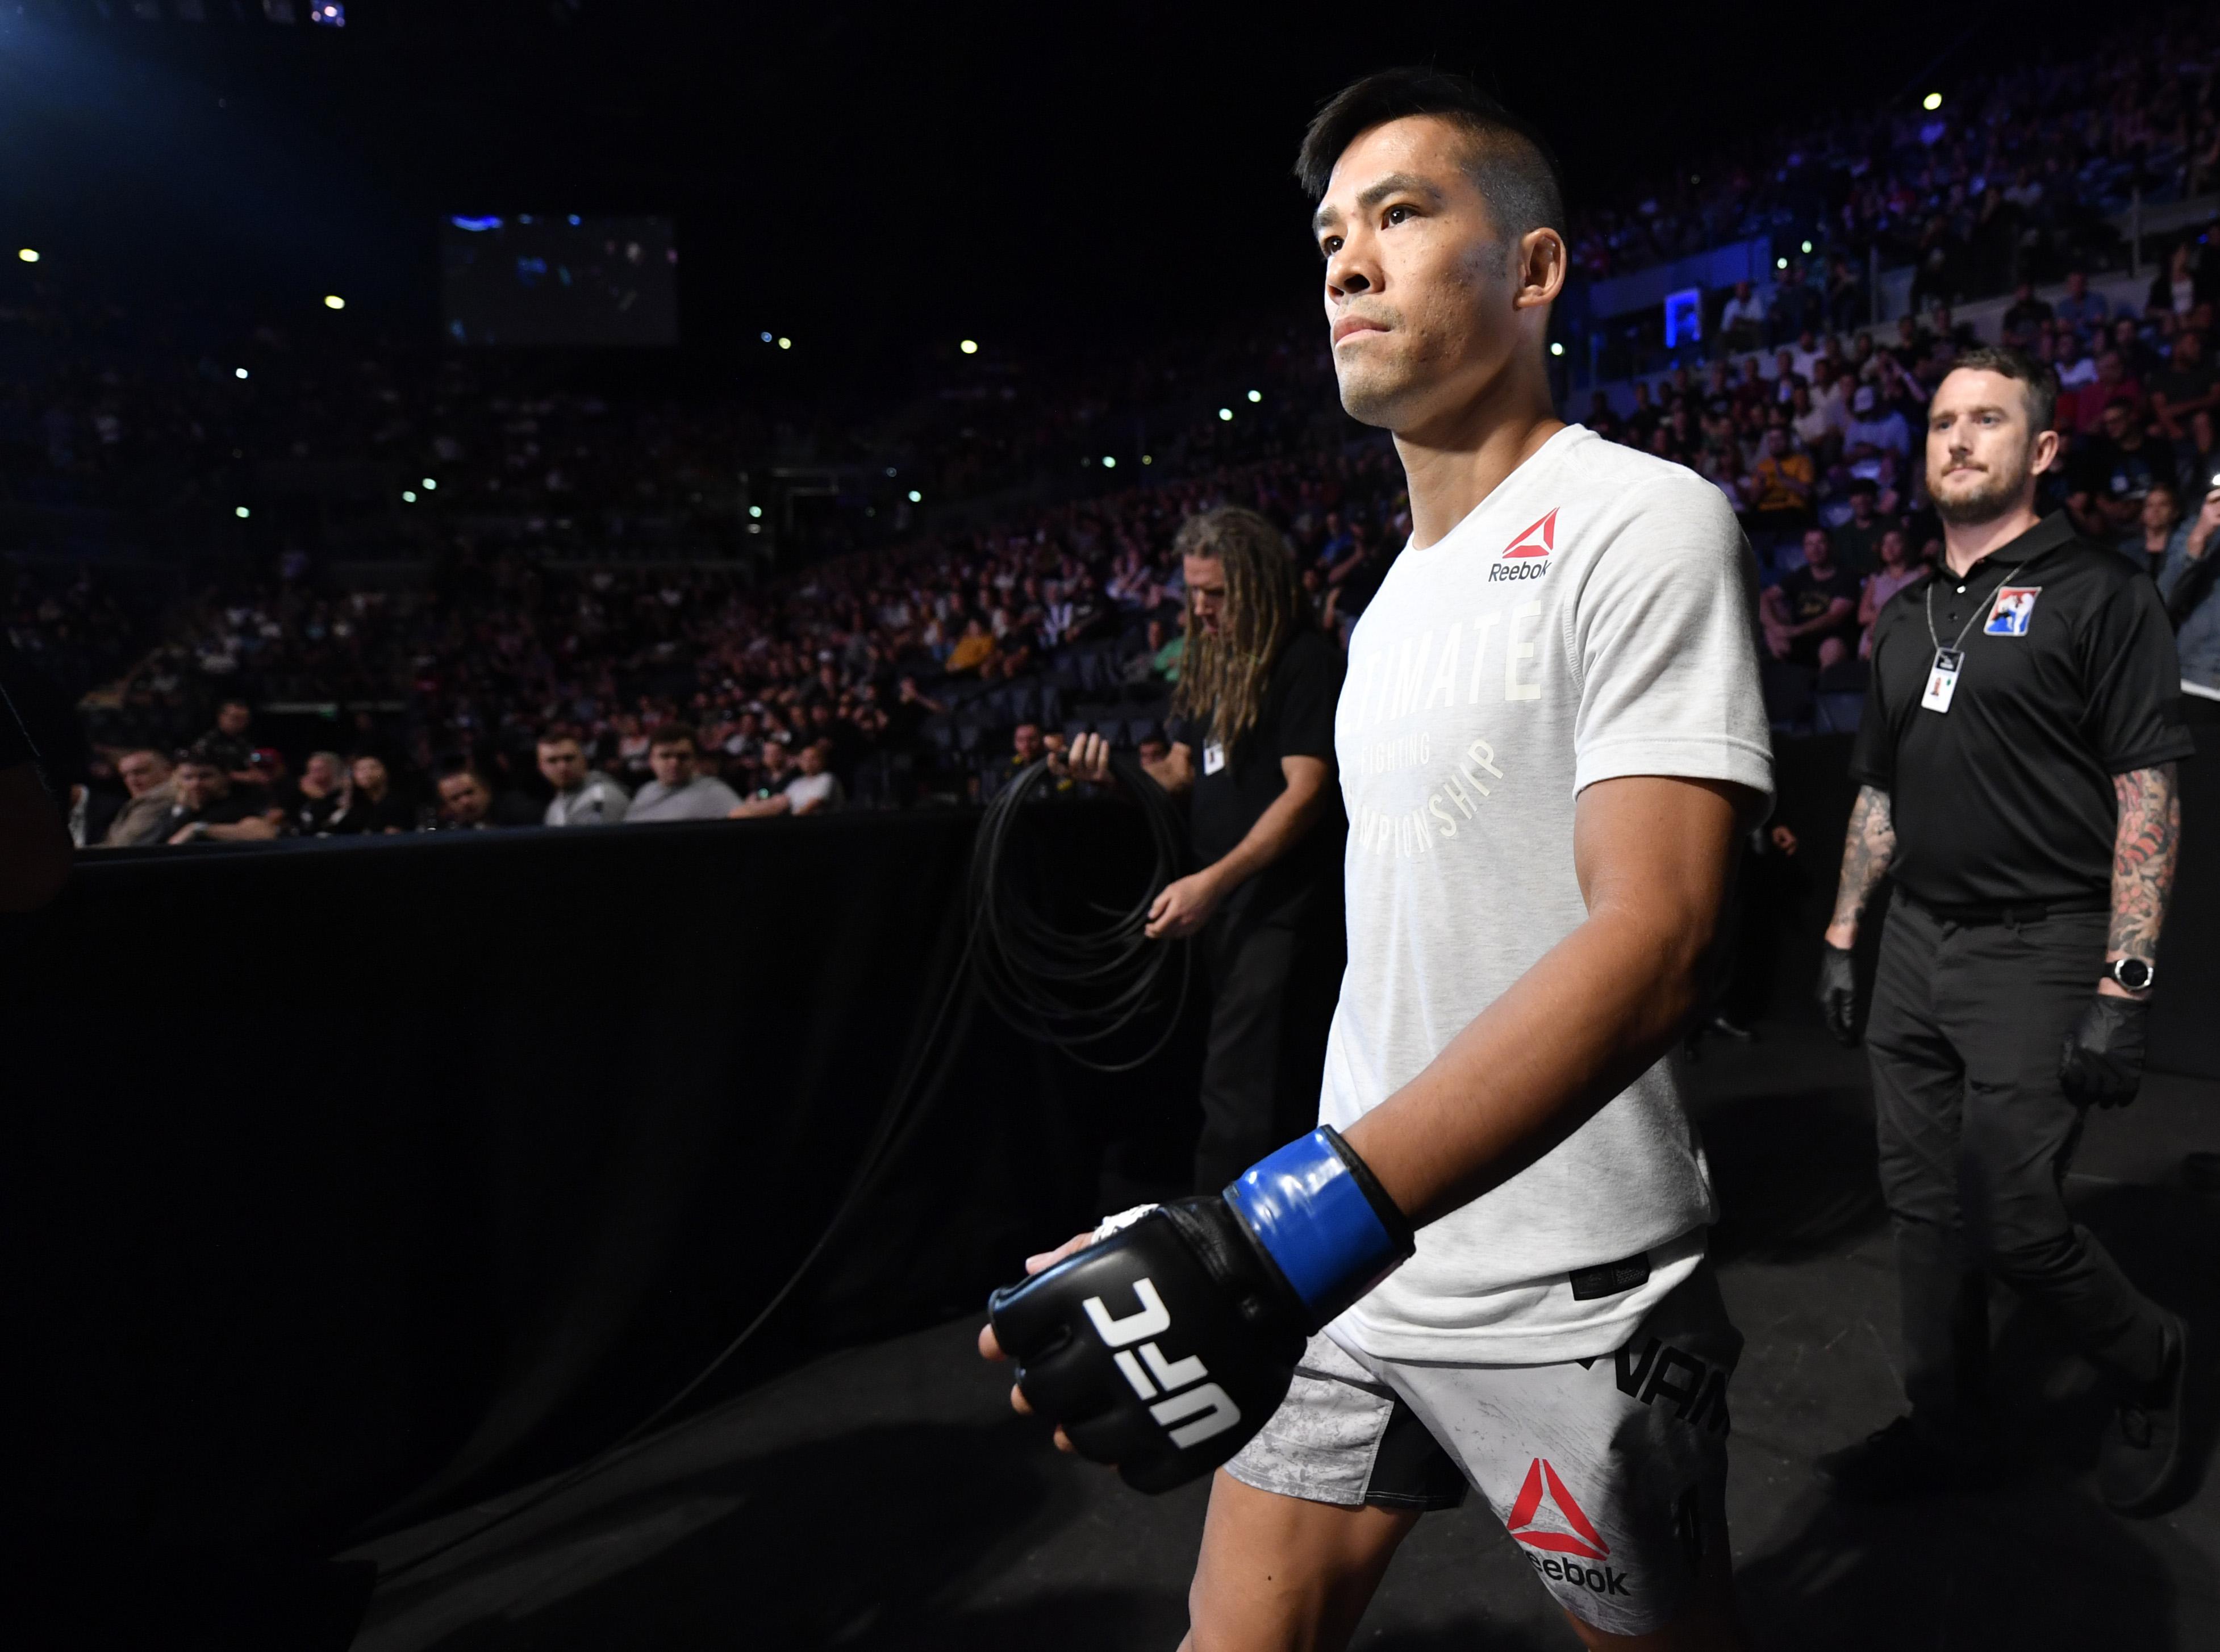 UFC Fight Night: Kara-France v Nam